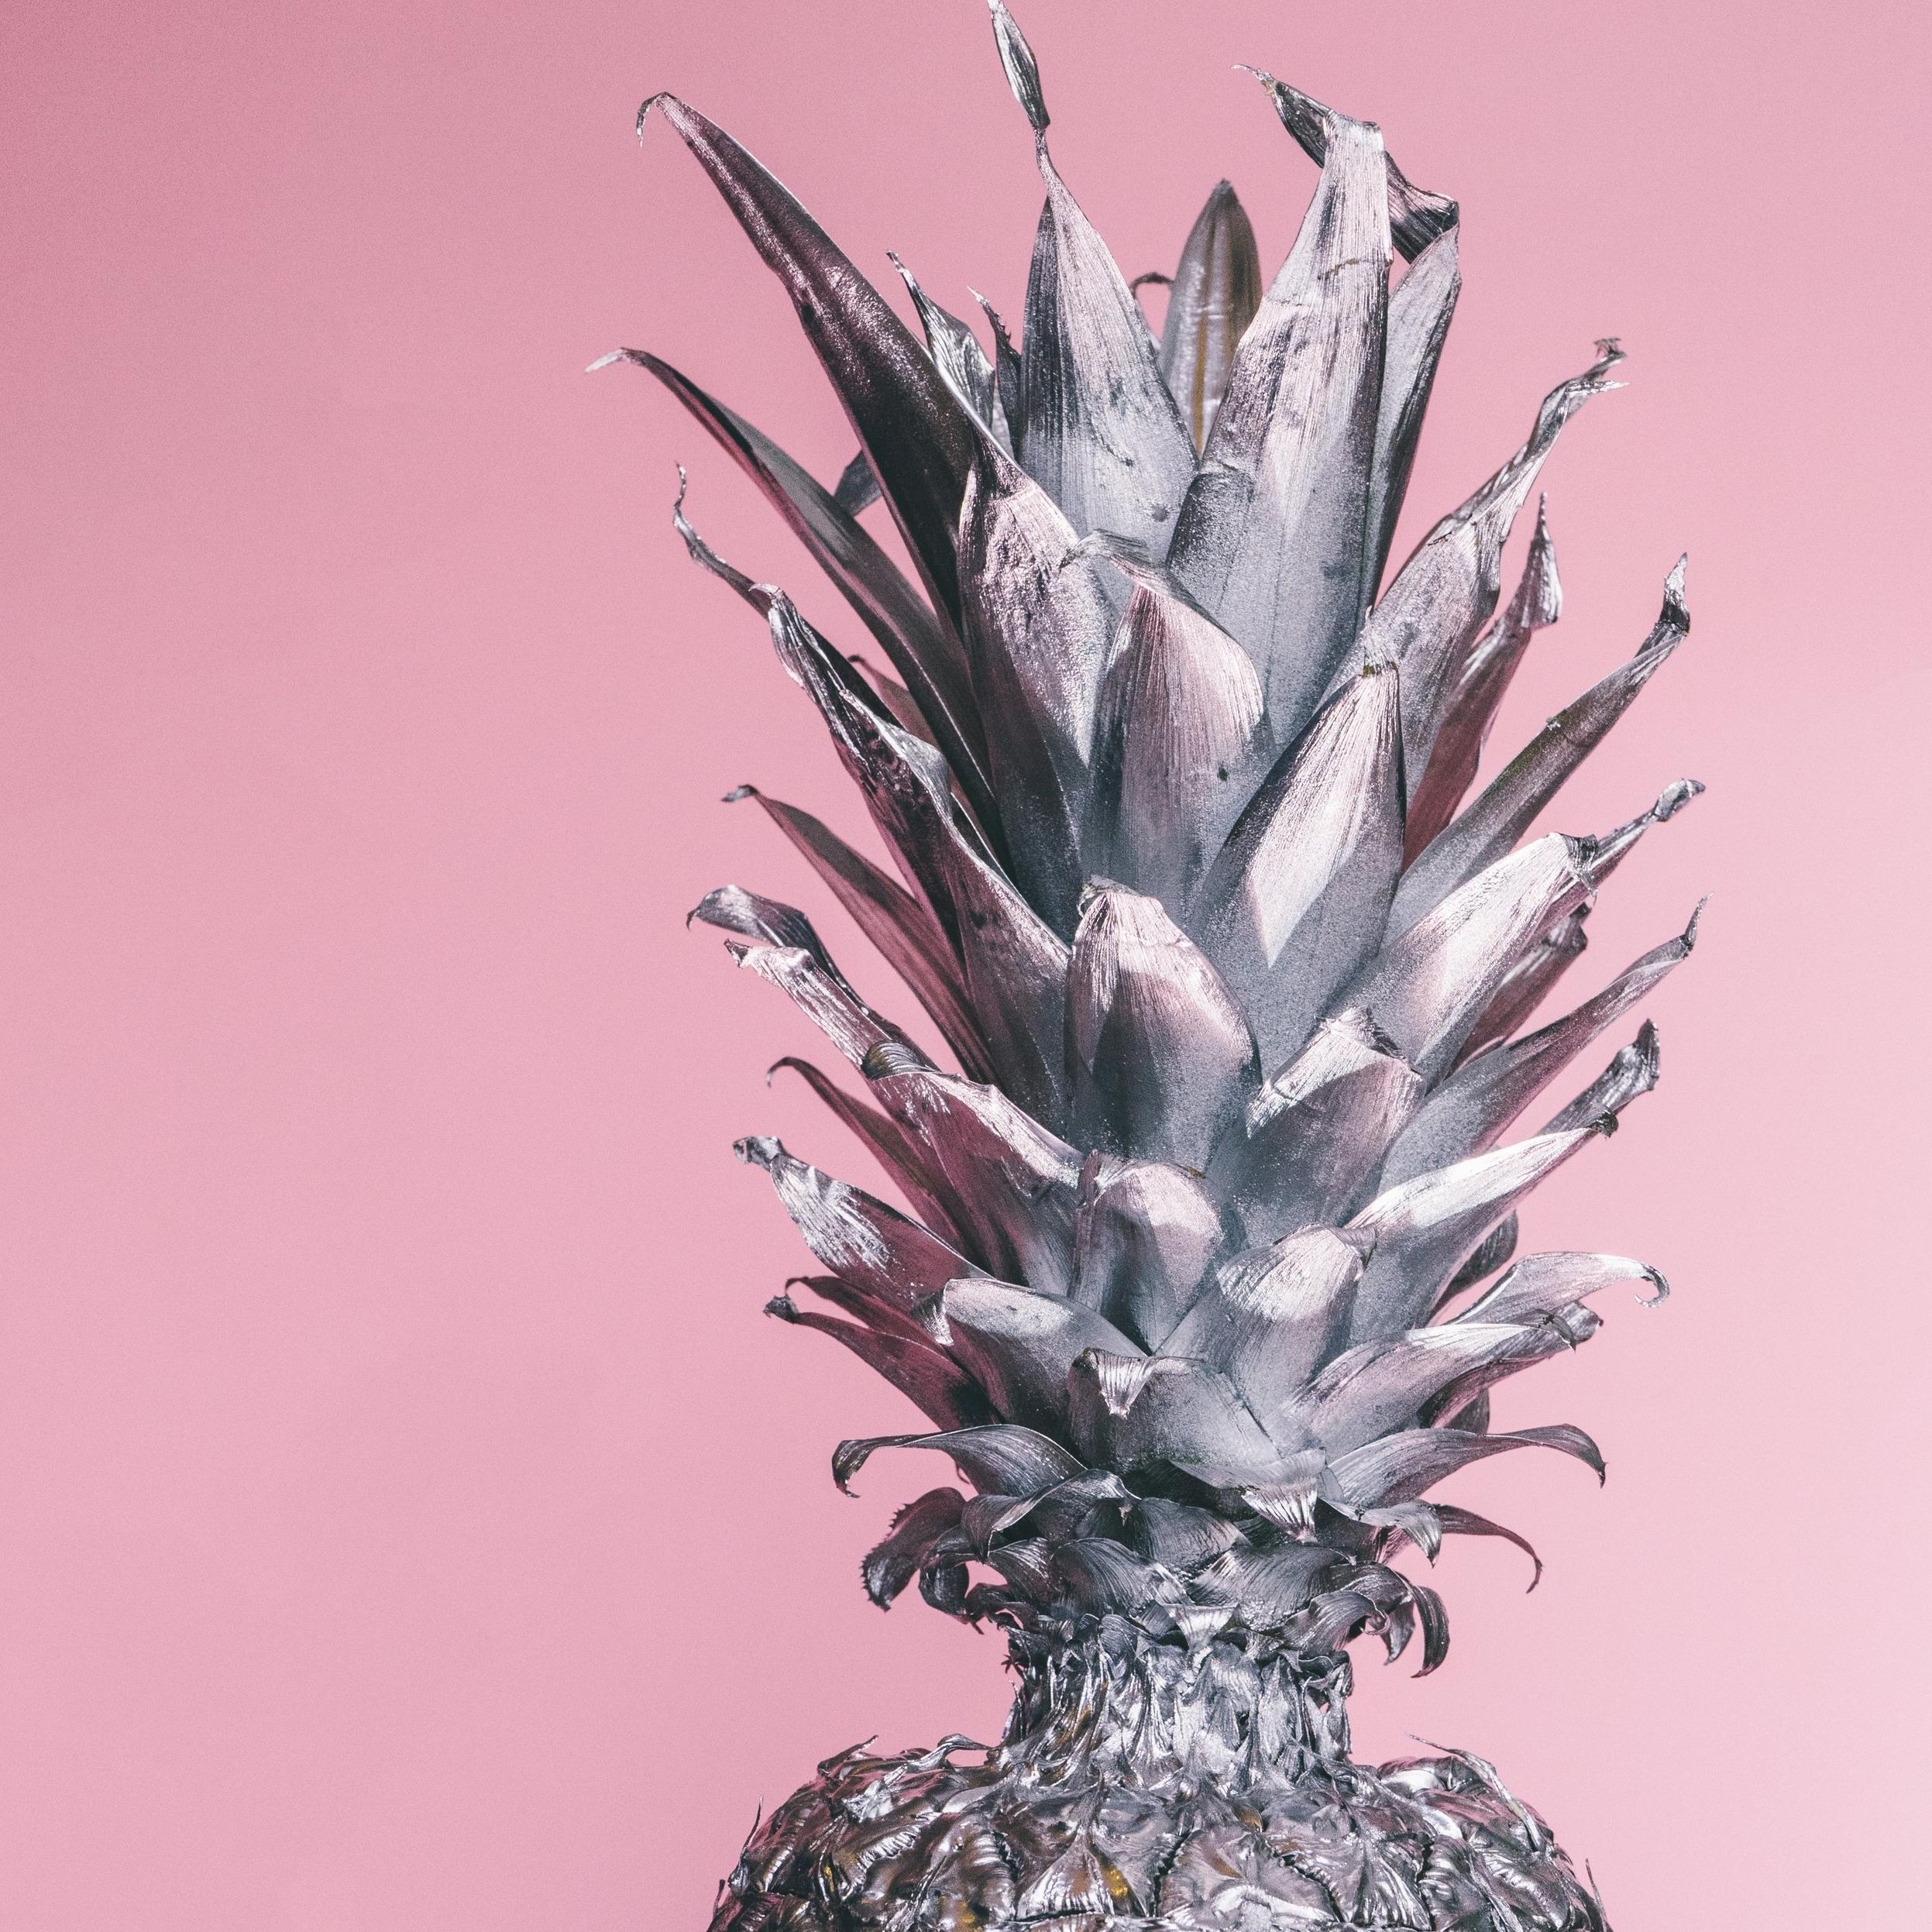 pineapple-supply-co-86279.jpg